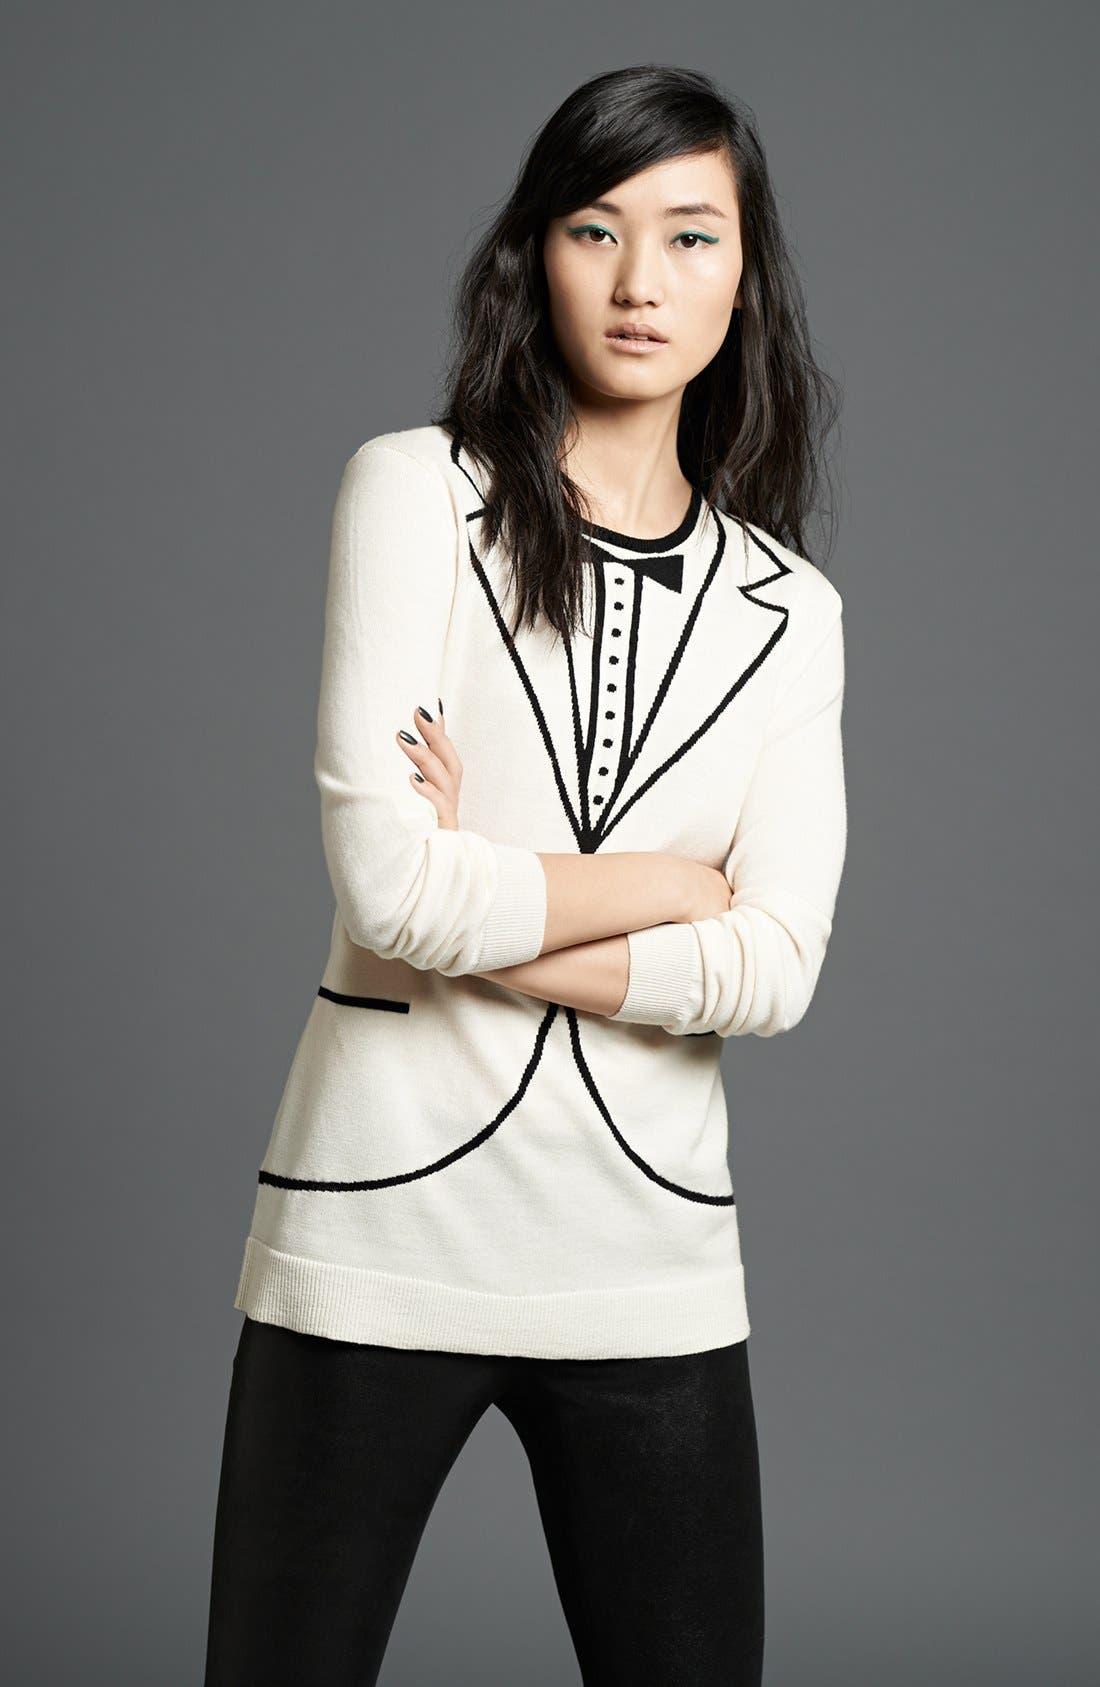 Main Image - L'AGENCE Sweater & Leggings